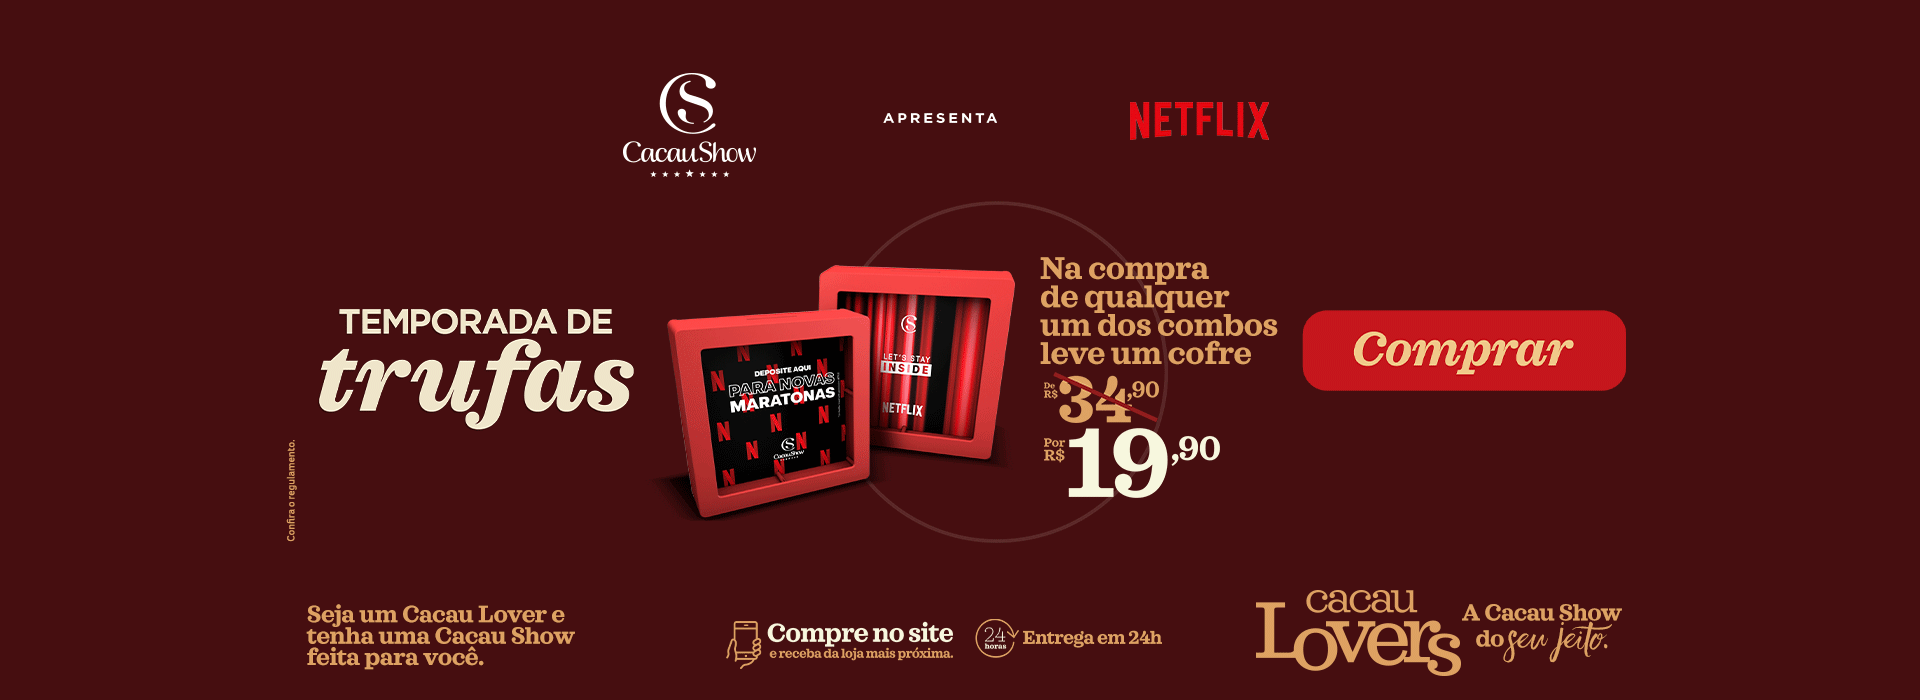 Cofre Netflix